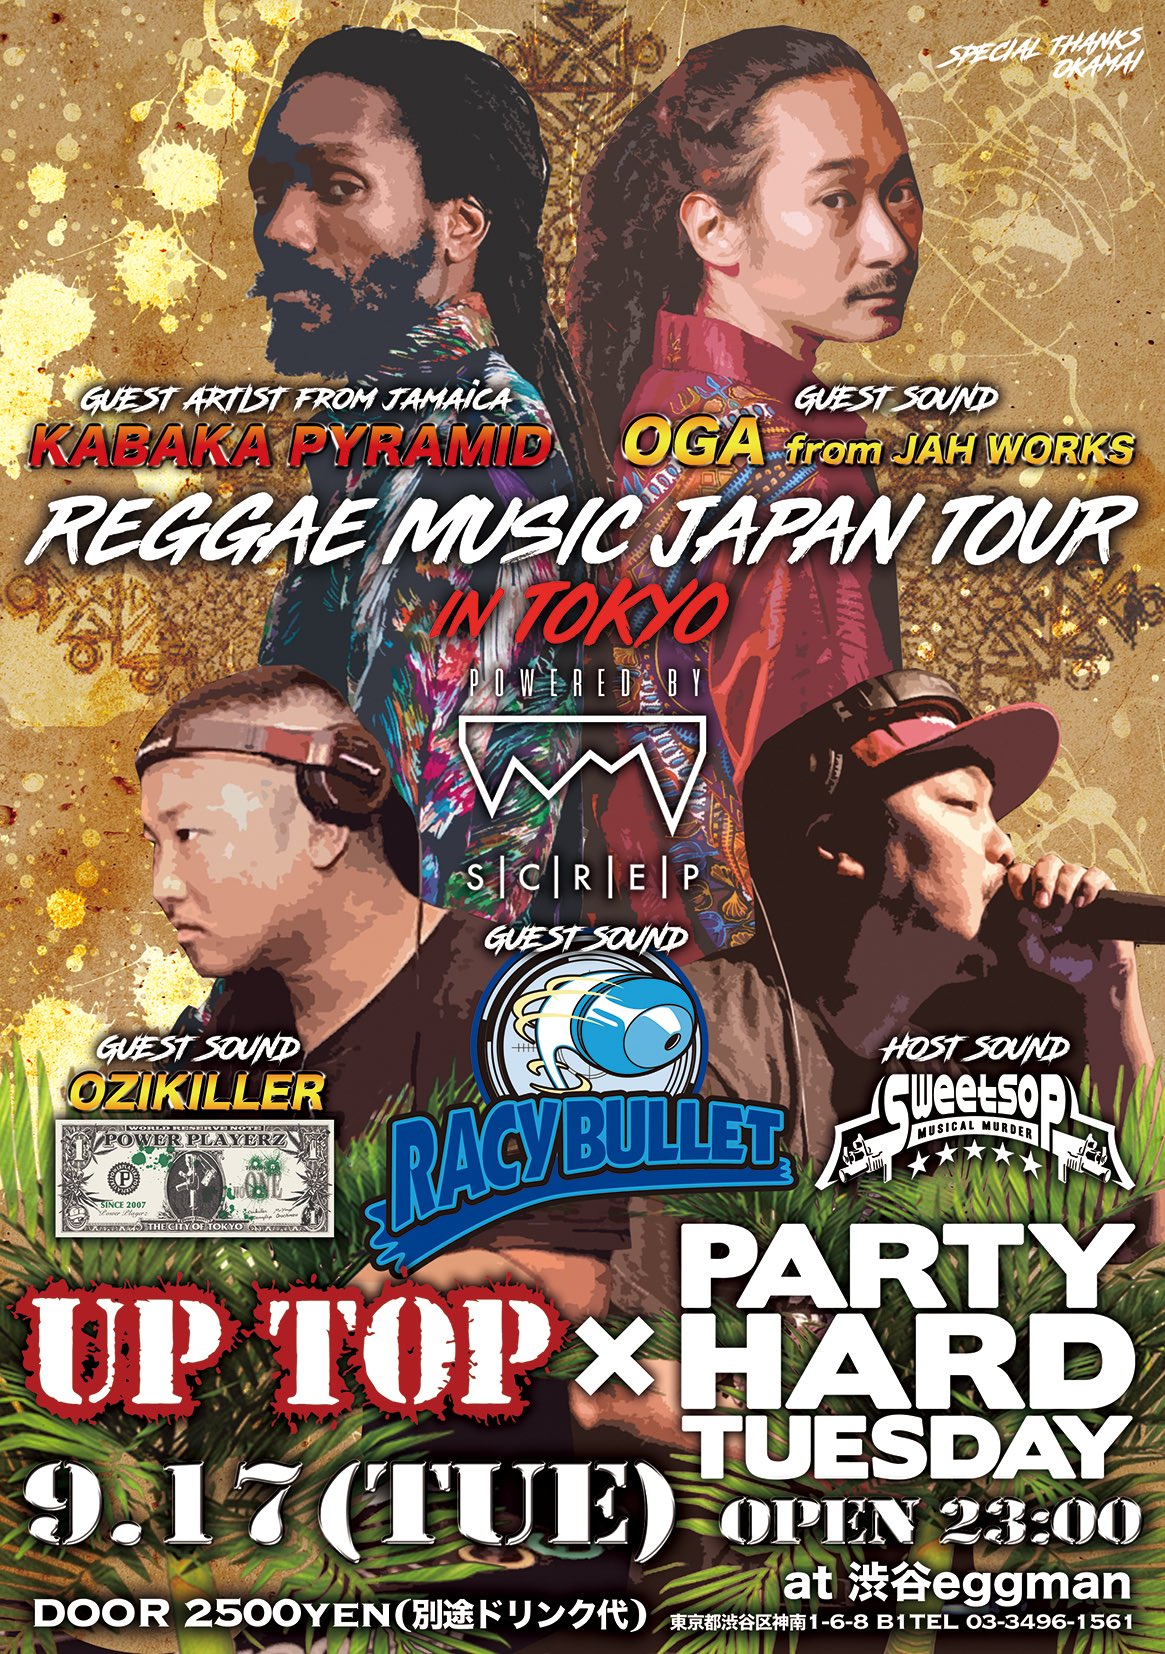 UP TOP × PARTY HARD TUSEDAY<br> 🇯🇲 KABAKA PYRAMID & OGA 🇯🇵 REGGAE MUSIC JAPAN TOUR 東京編